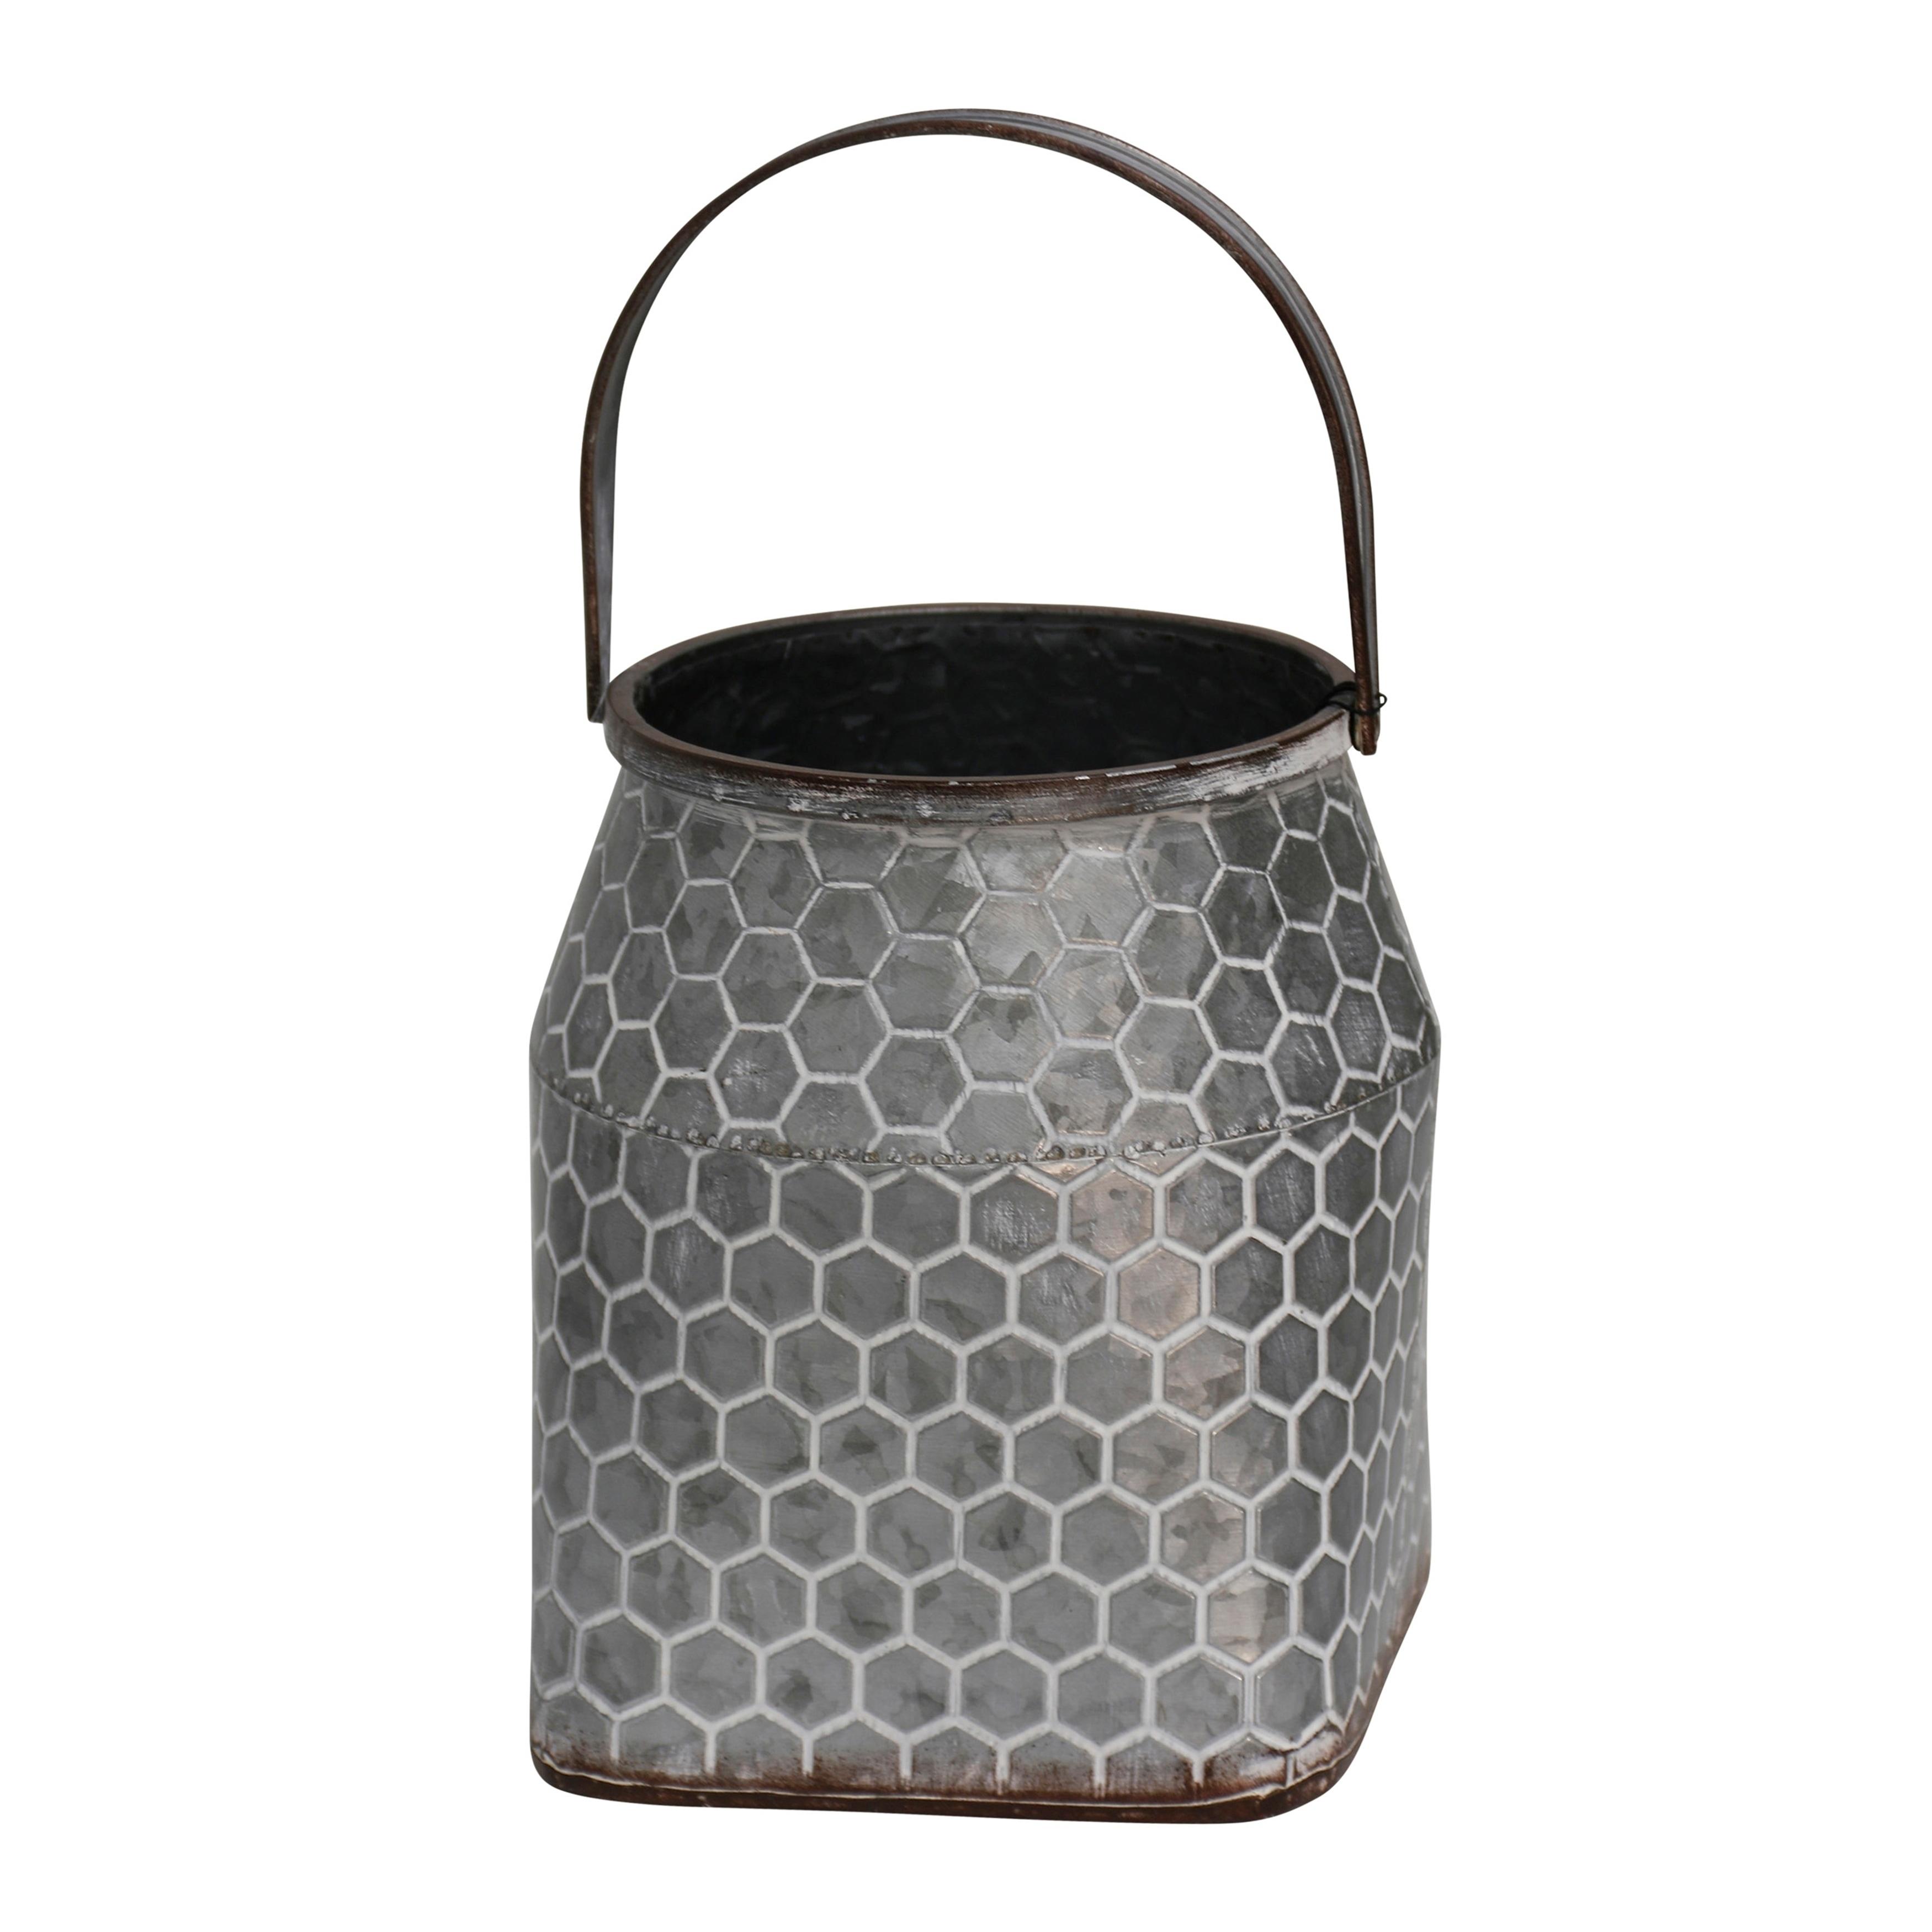 Short Hive Pattern Milk Pail Galvanized Metal Vase with Handle